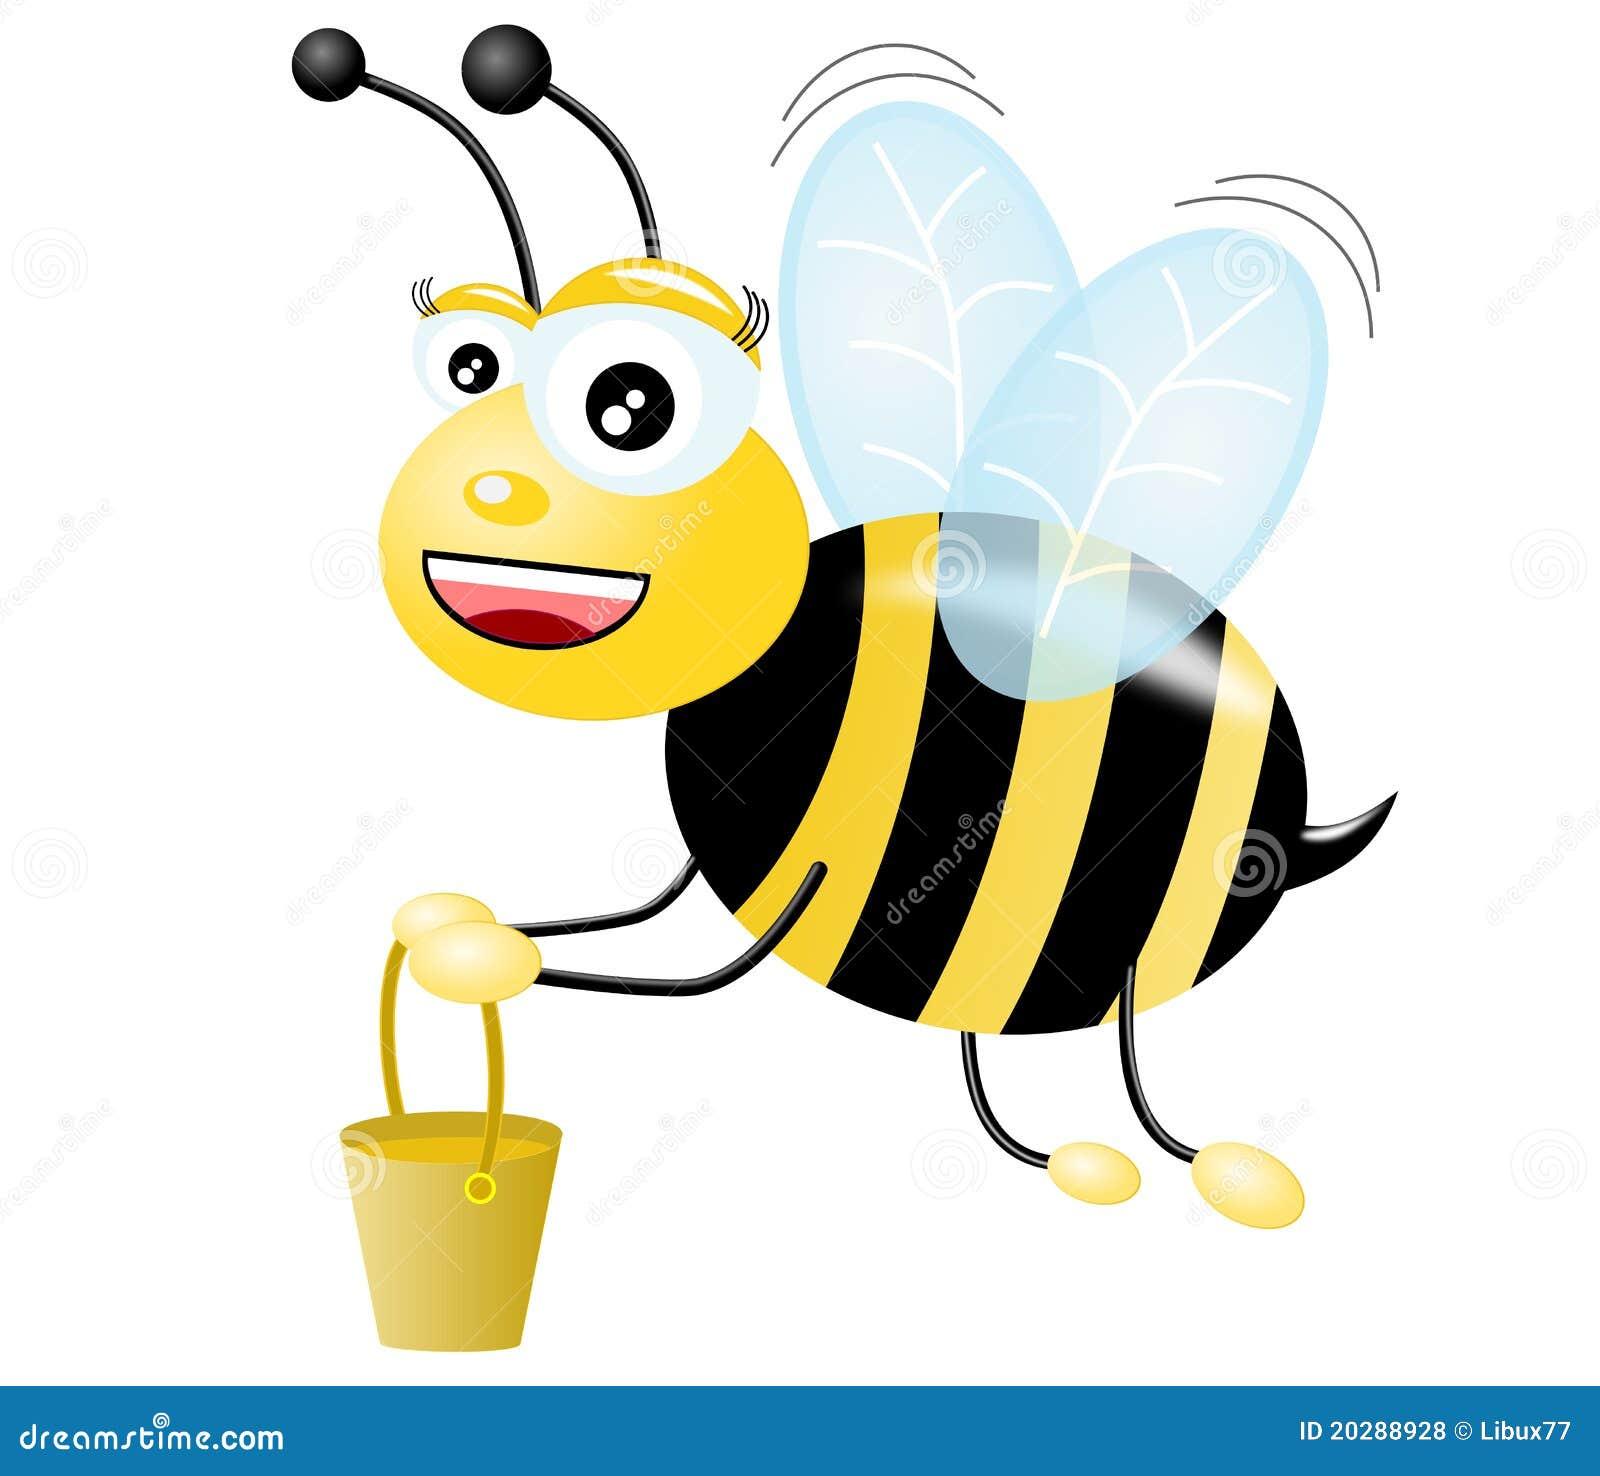 Bumble Bee Invitation is amazing invitations design